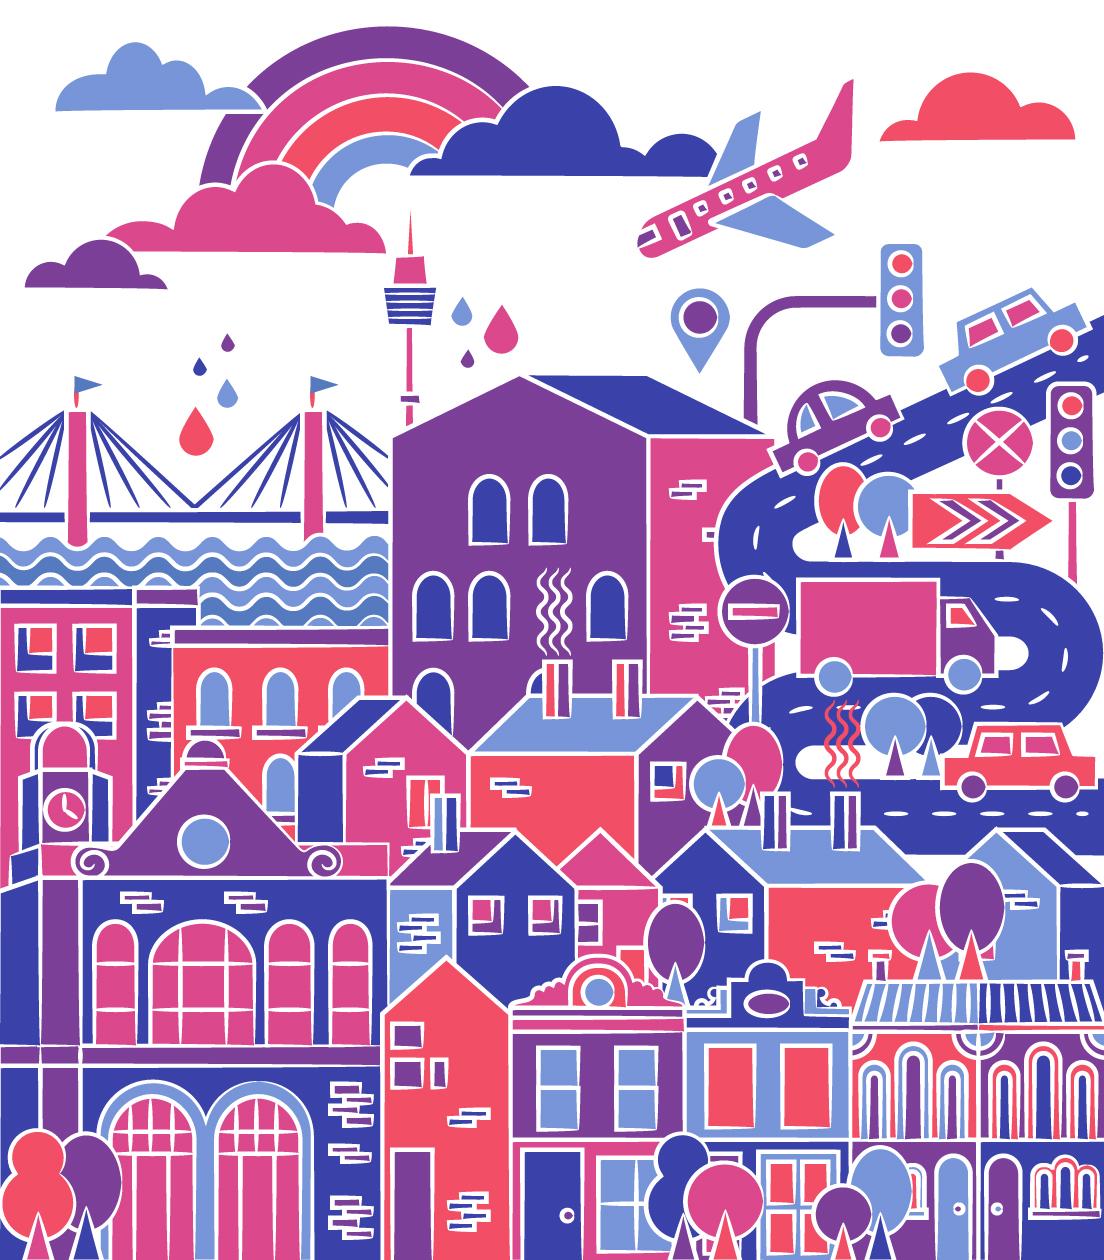 city-collage-5.jpg